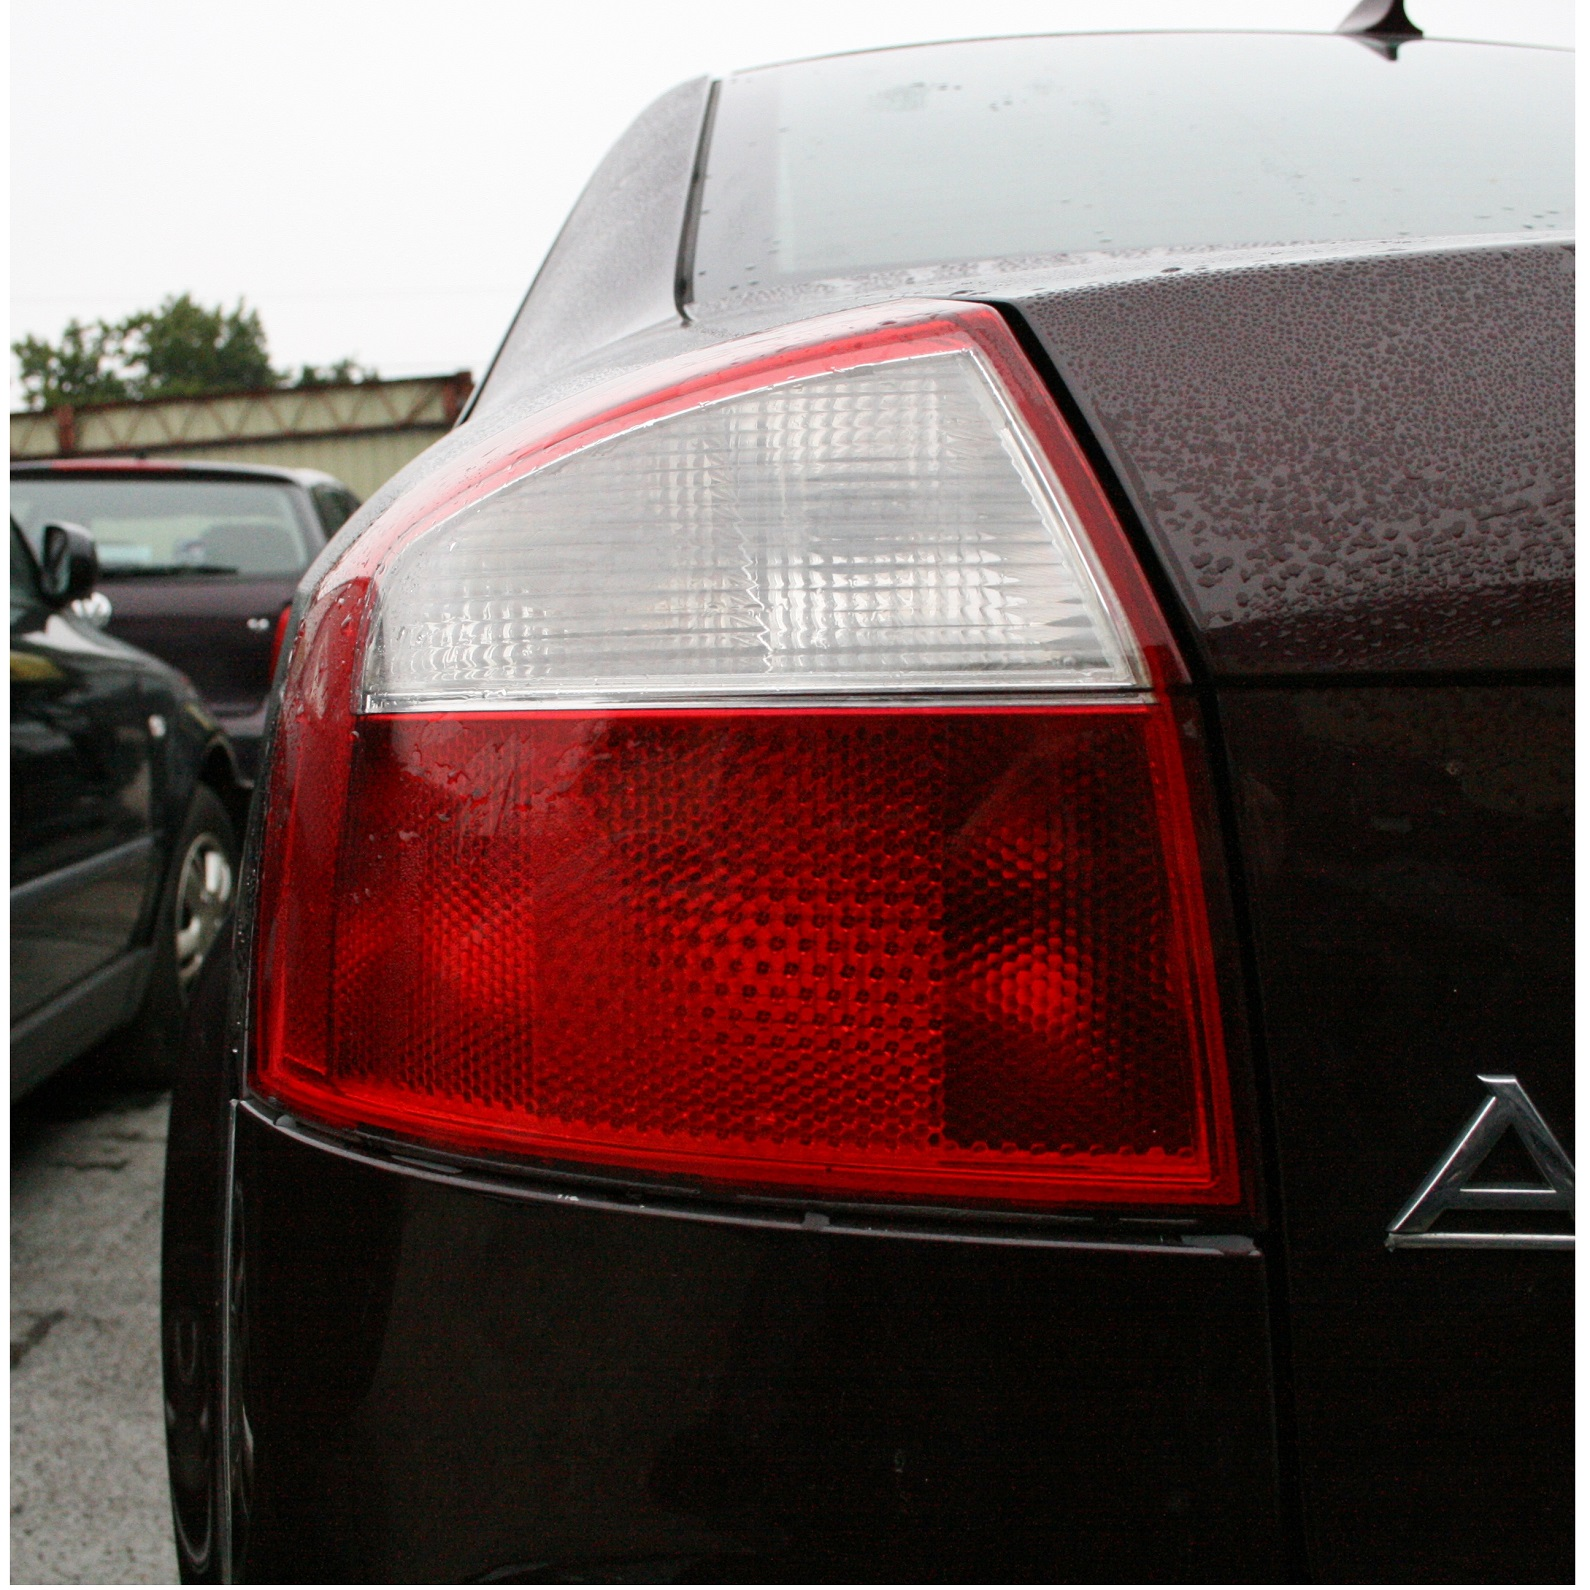 Used Genuine VW Audi Passenger Side Rear Rear Light